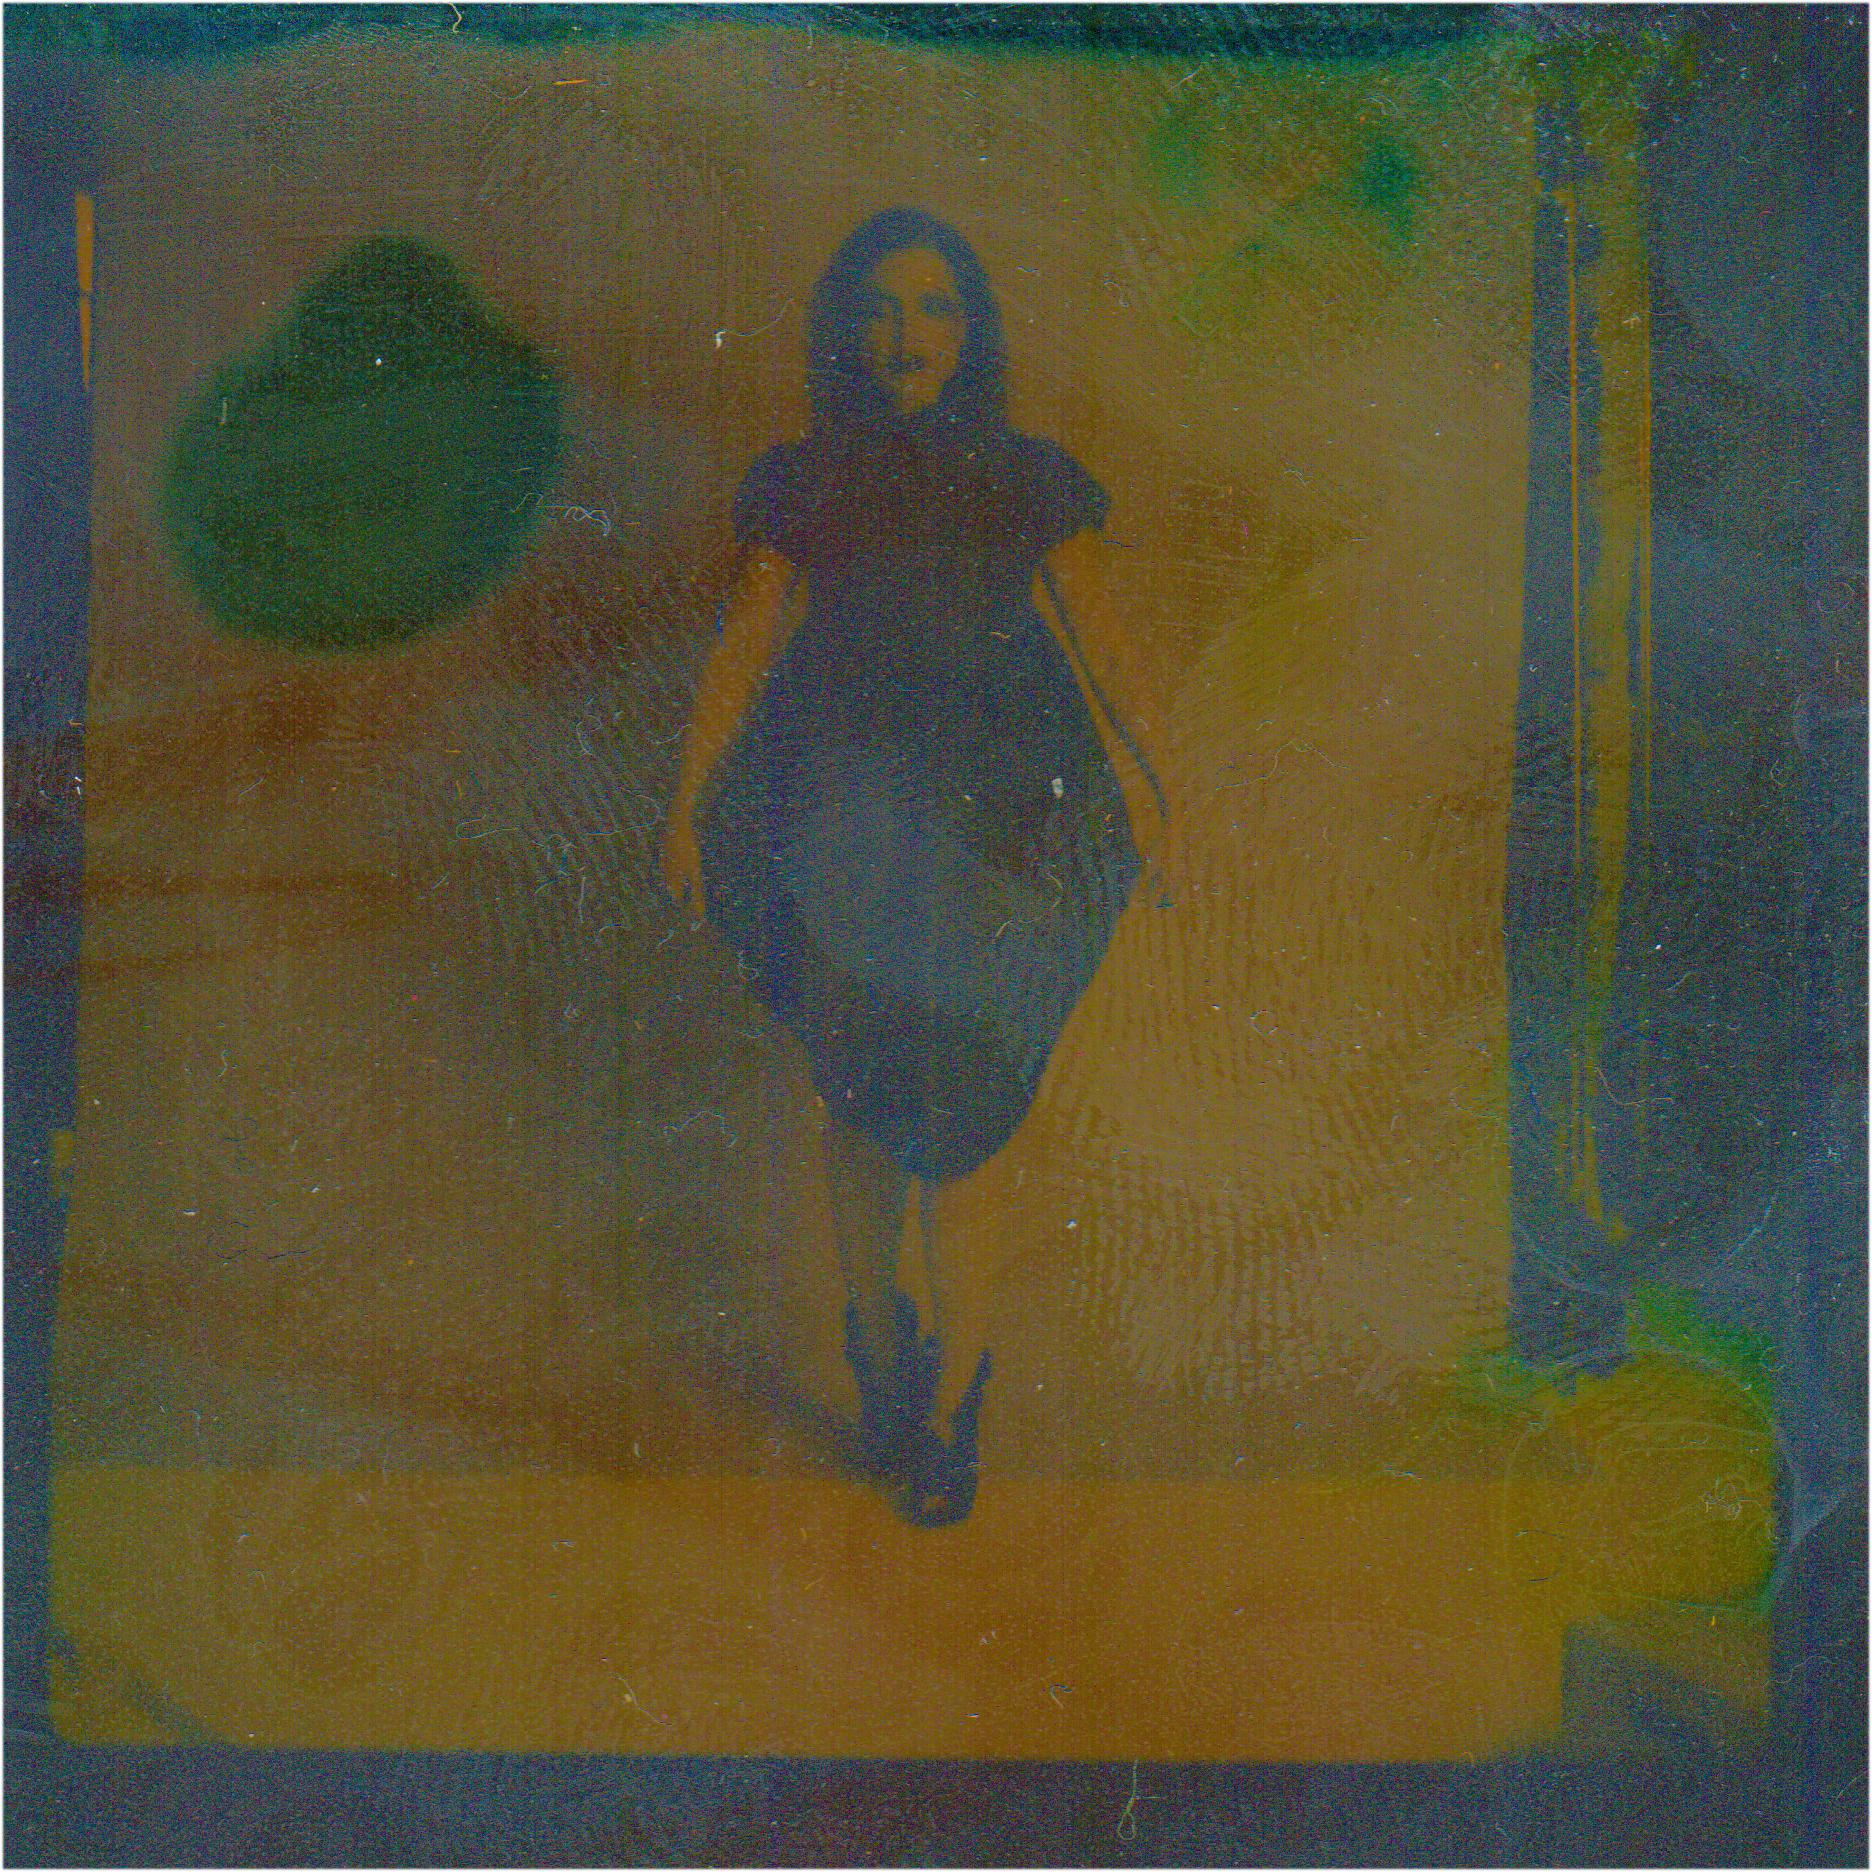 Sofia Bush Negative